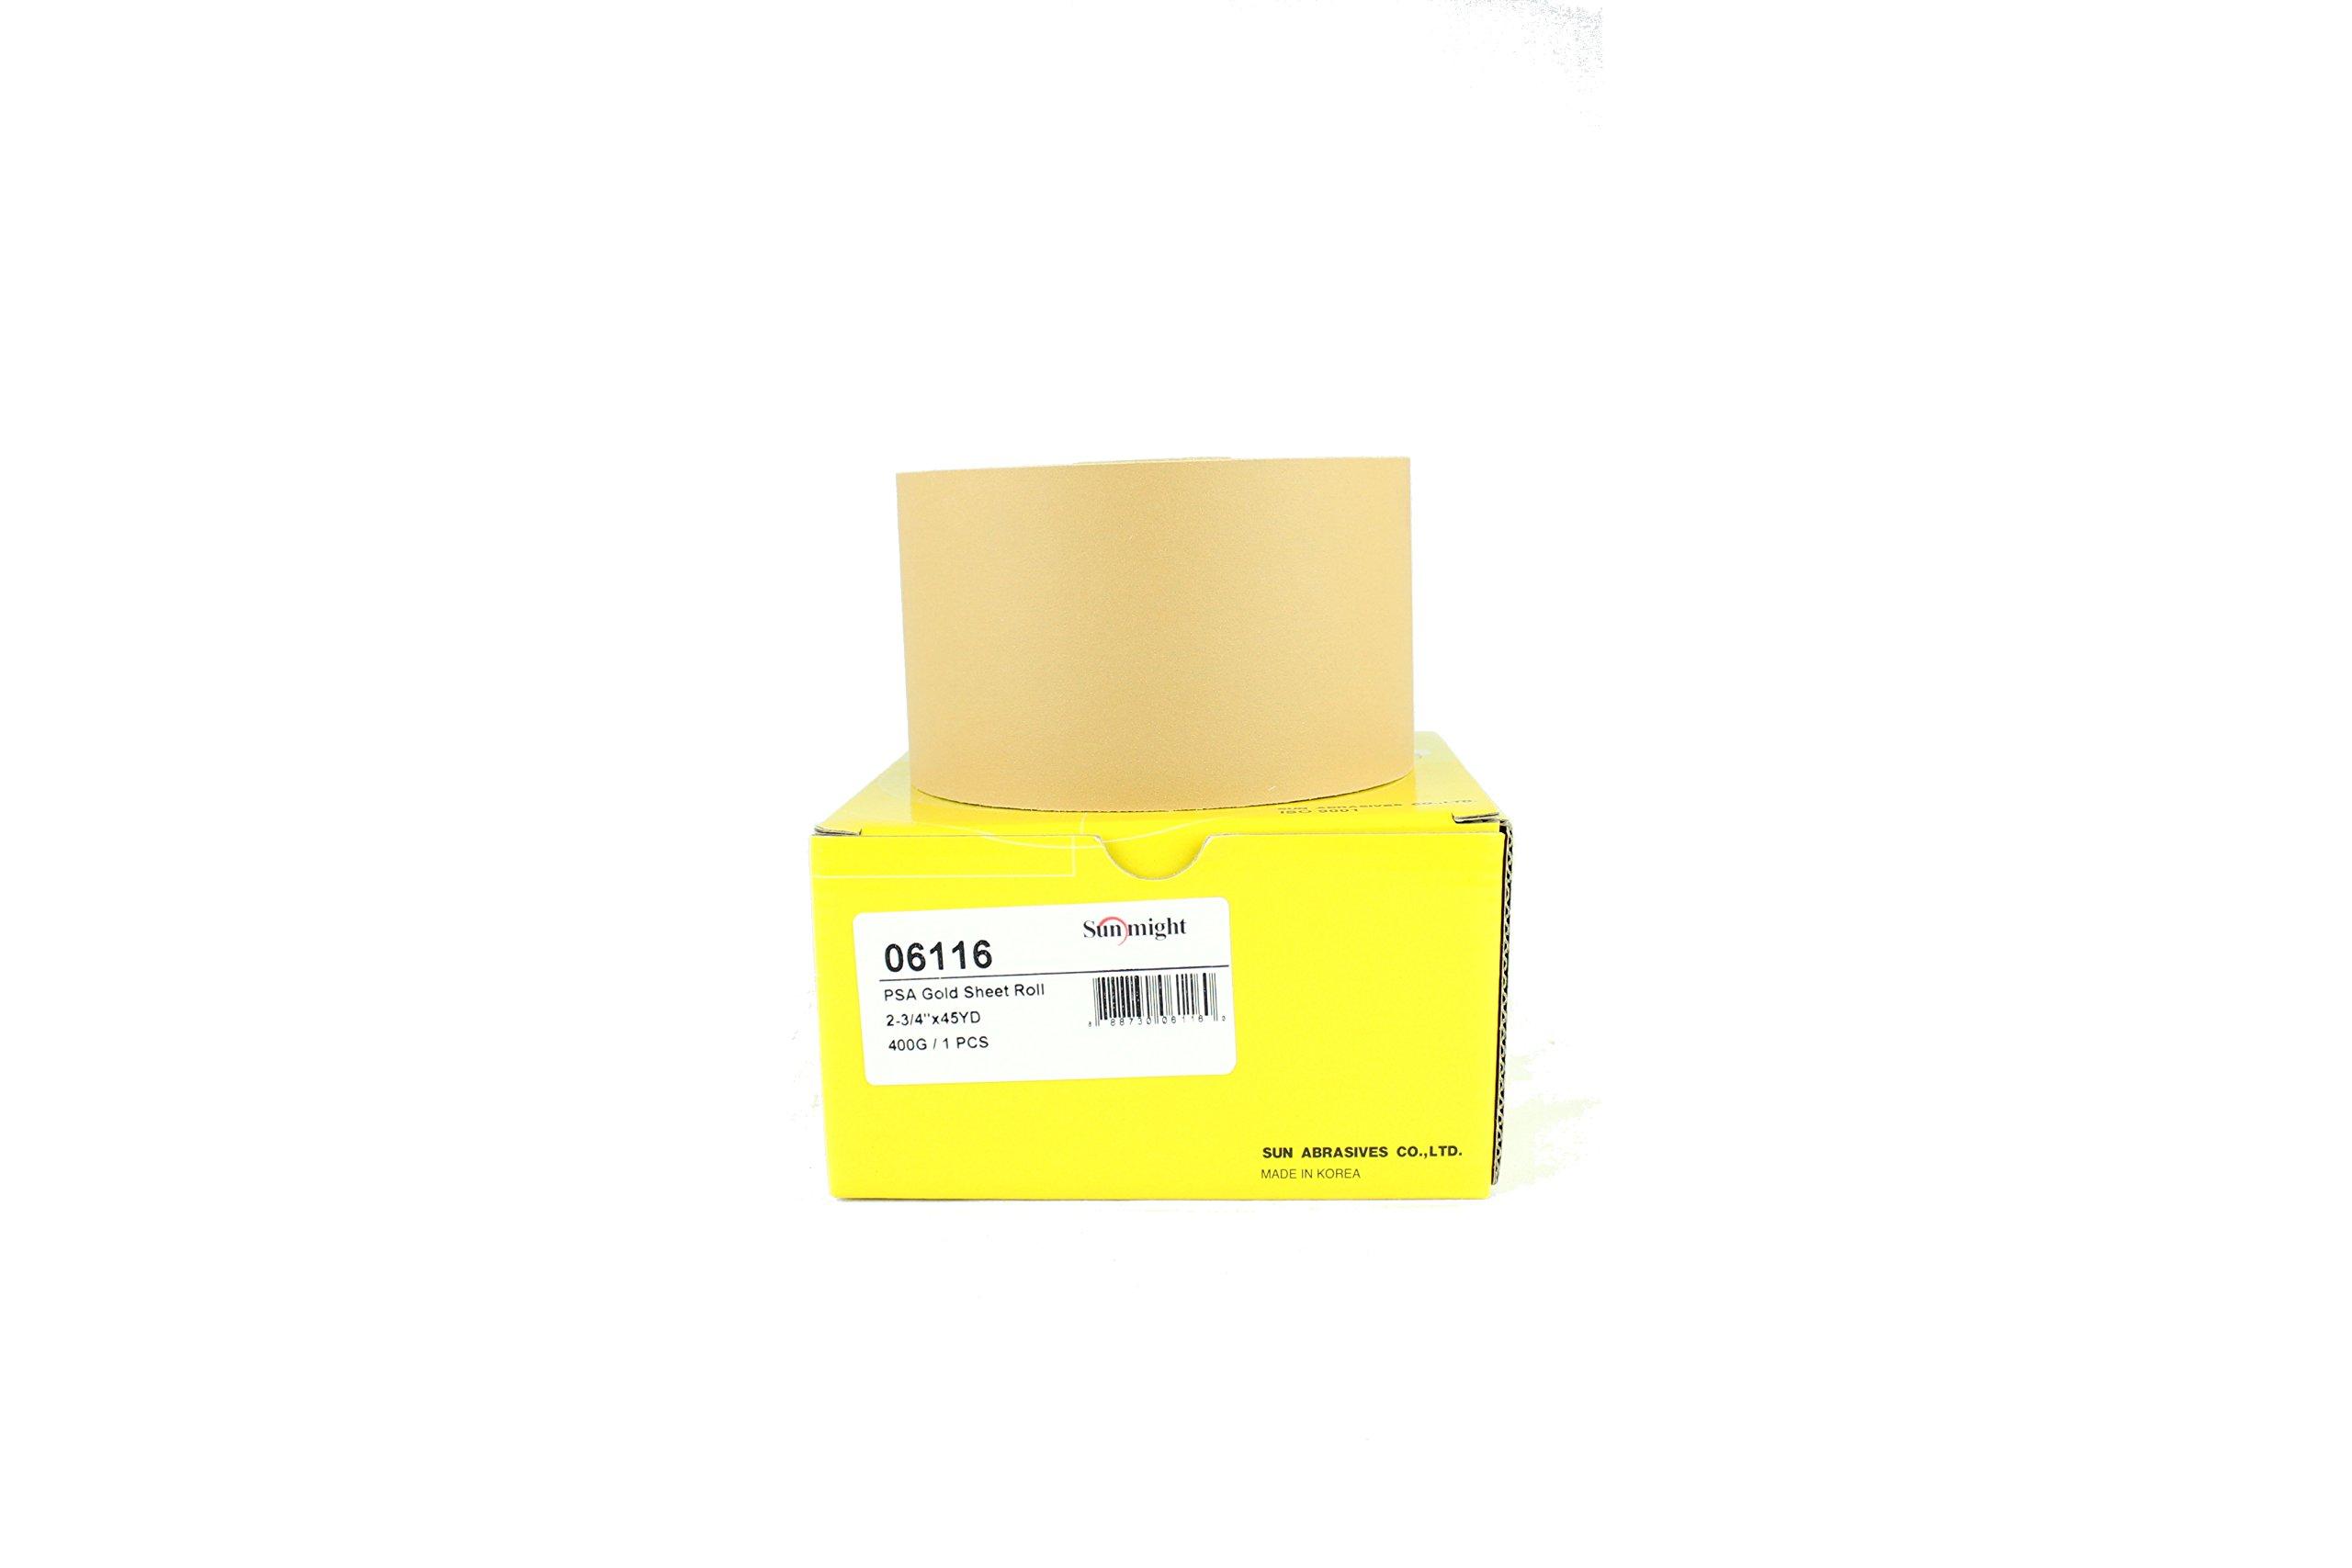 Sunmight 06116 2-3/4'' X 45 yd PSA Sheet Roll (Gold Grit 400)